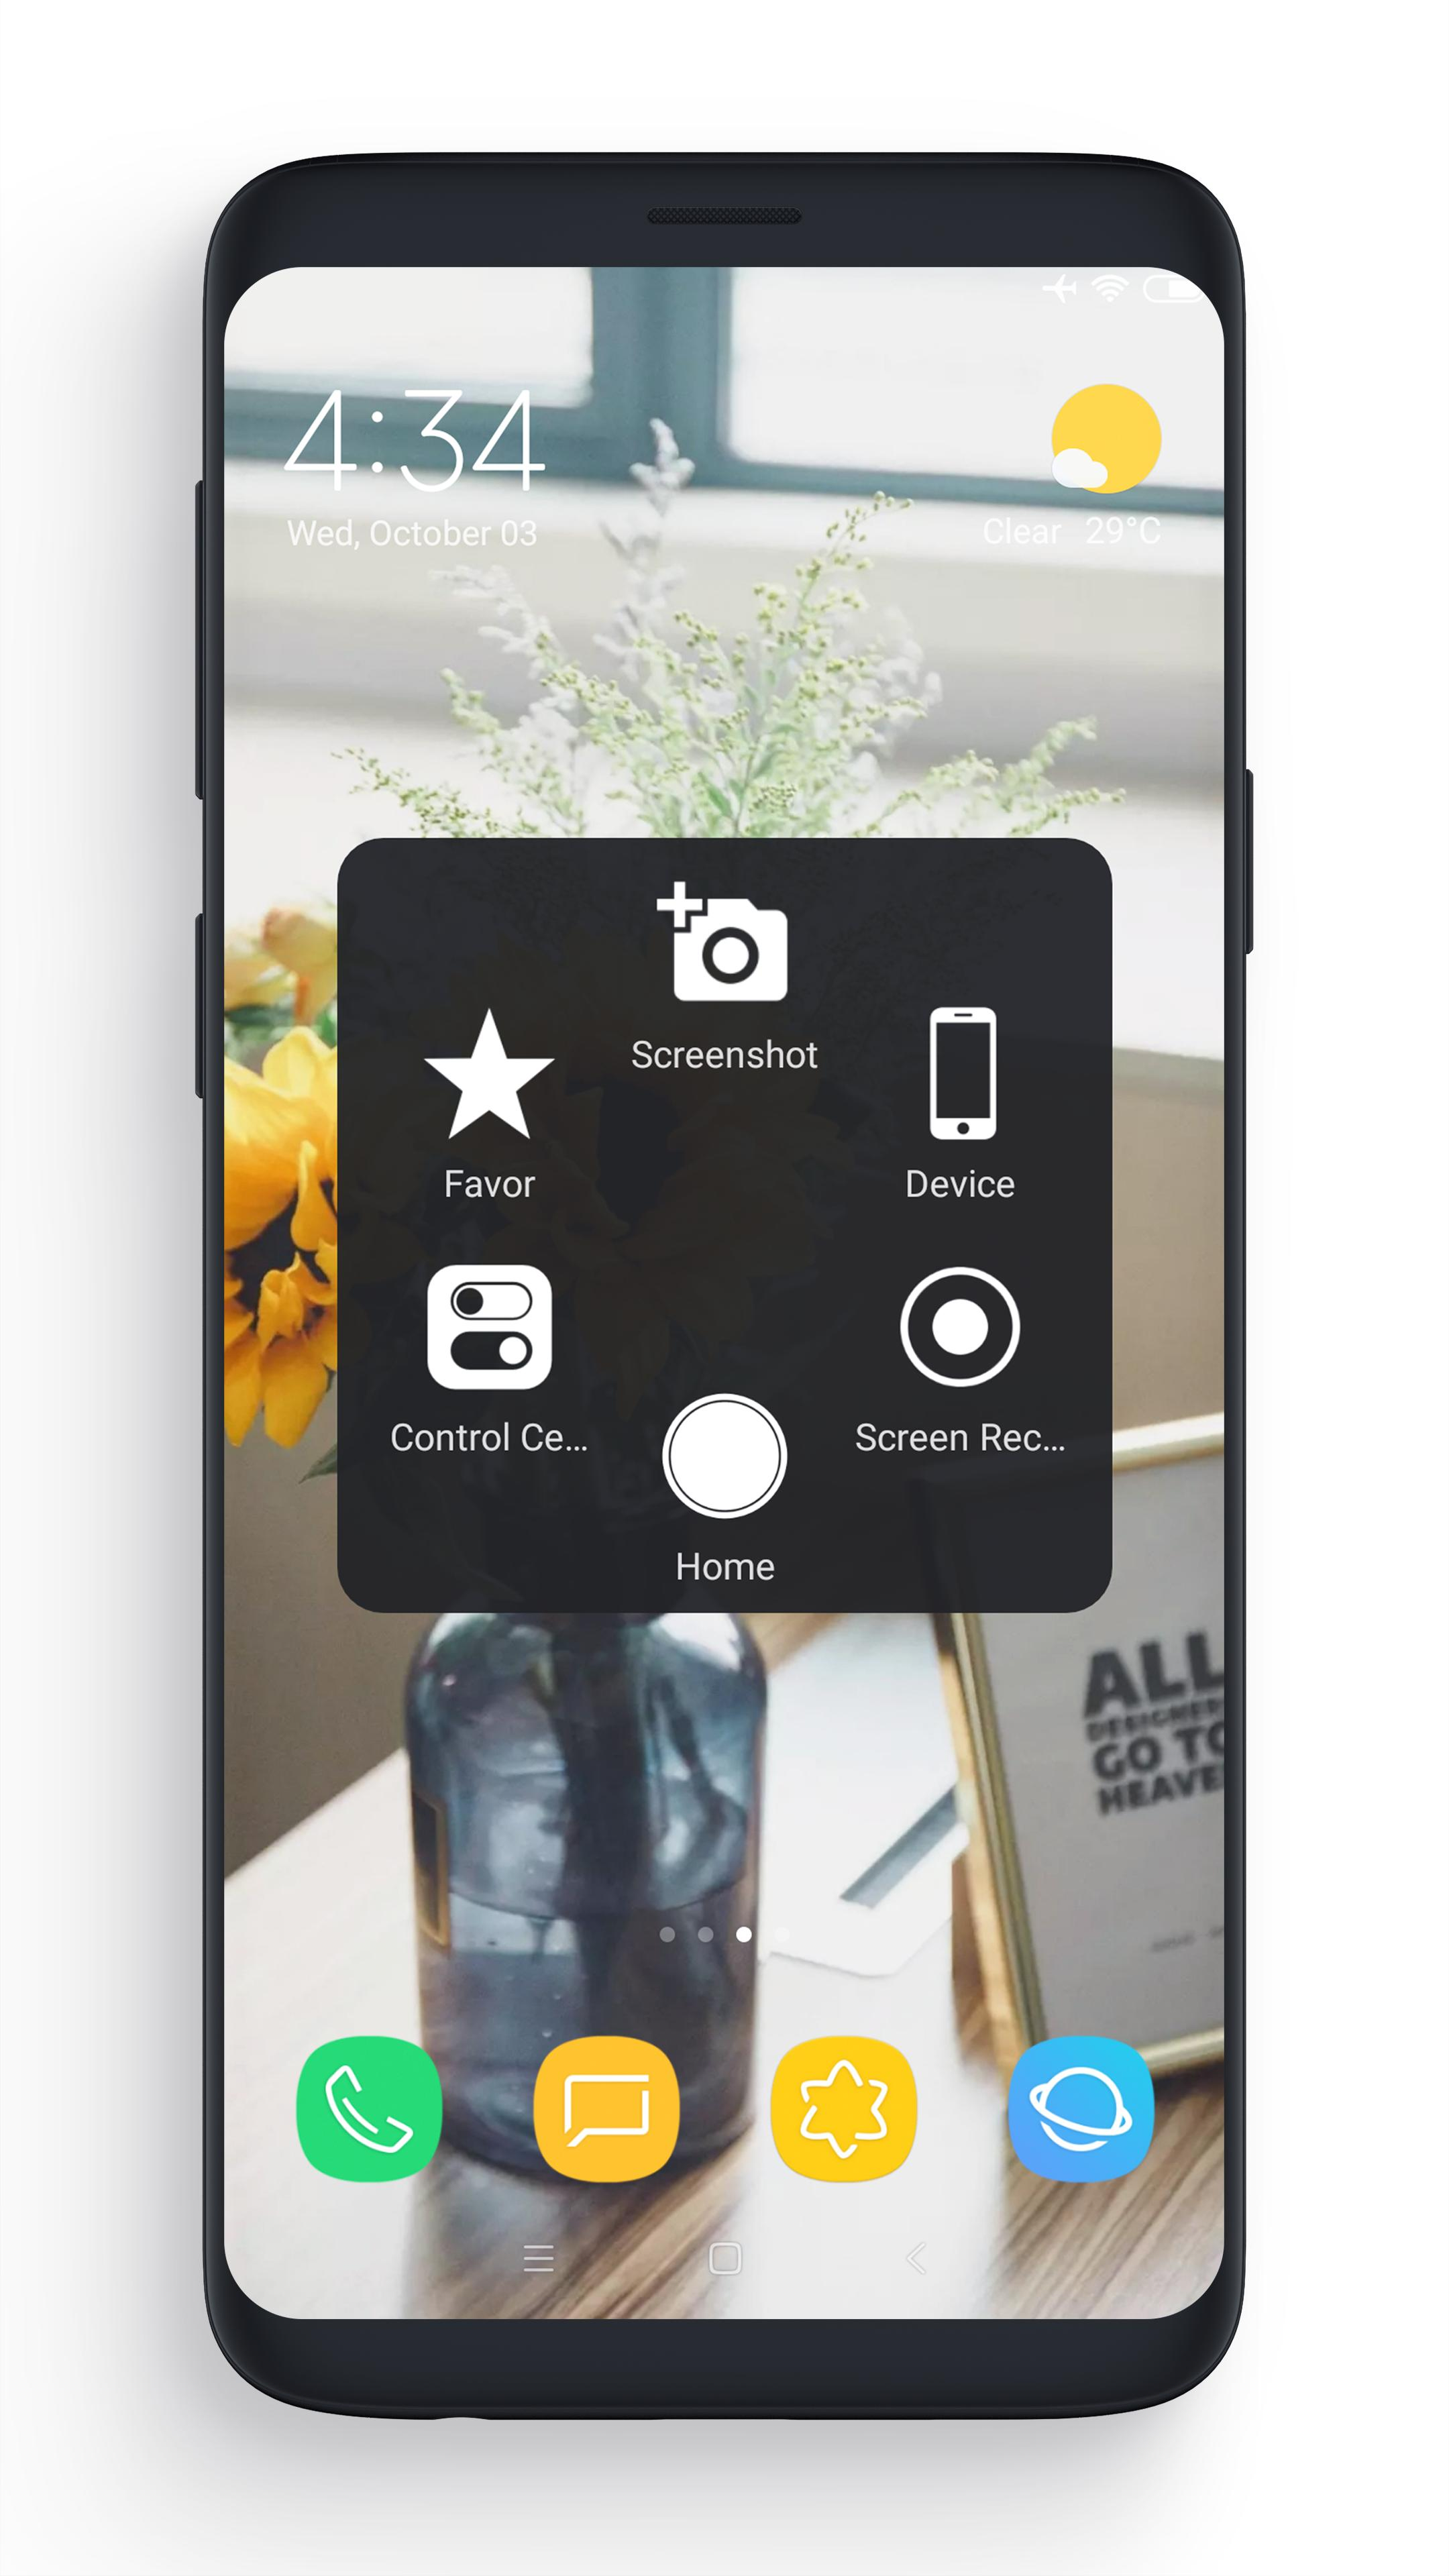 Donlot aplikasi samsung Assistive Touch